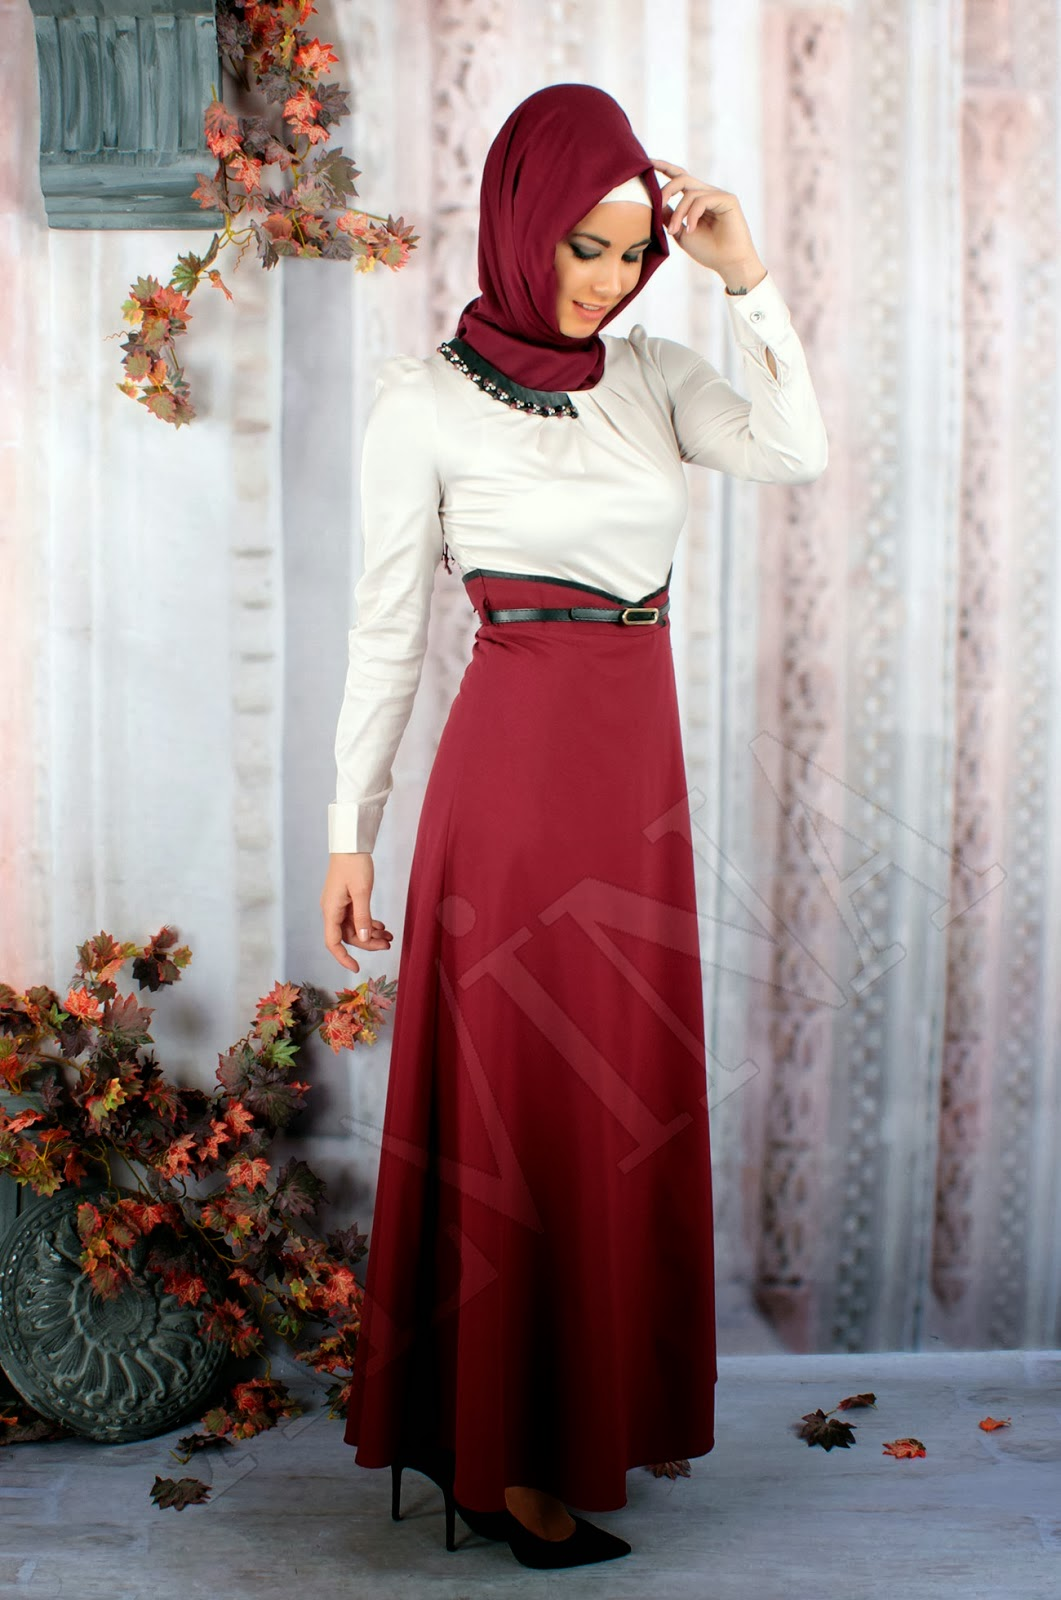 mode-hijab-turque-mode